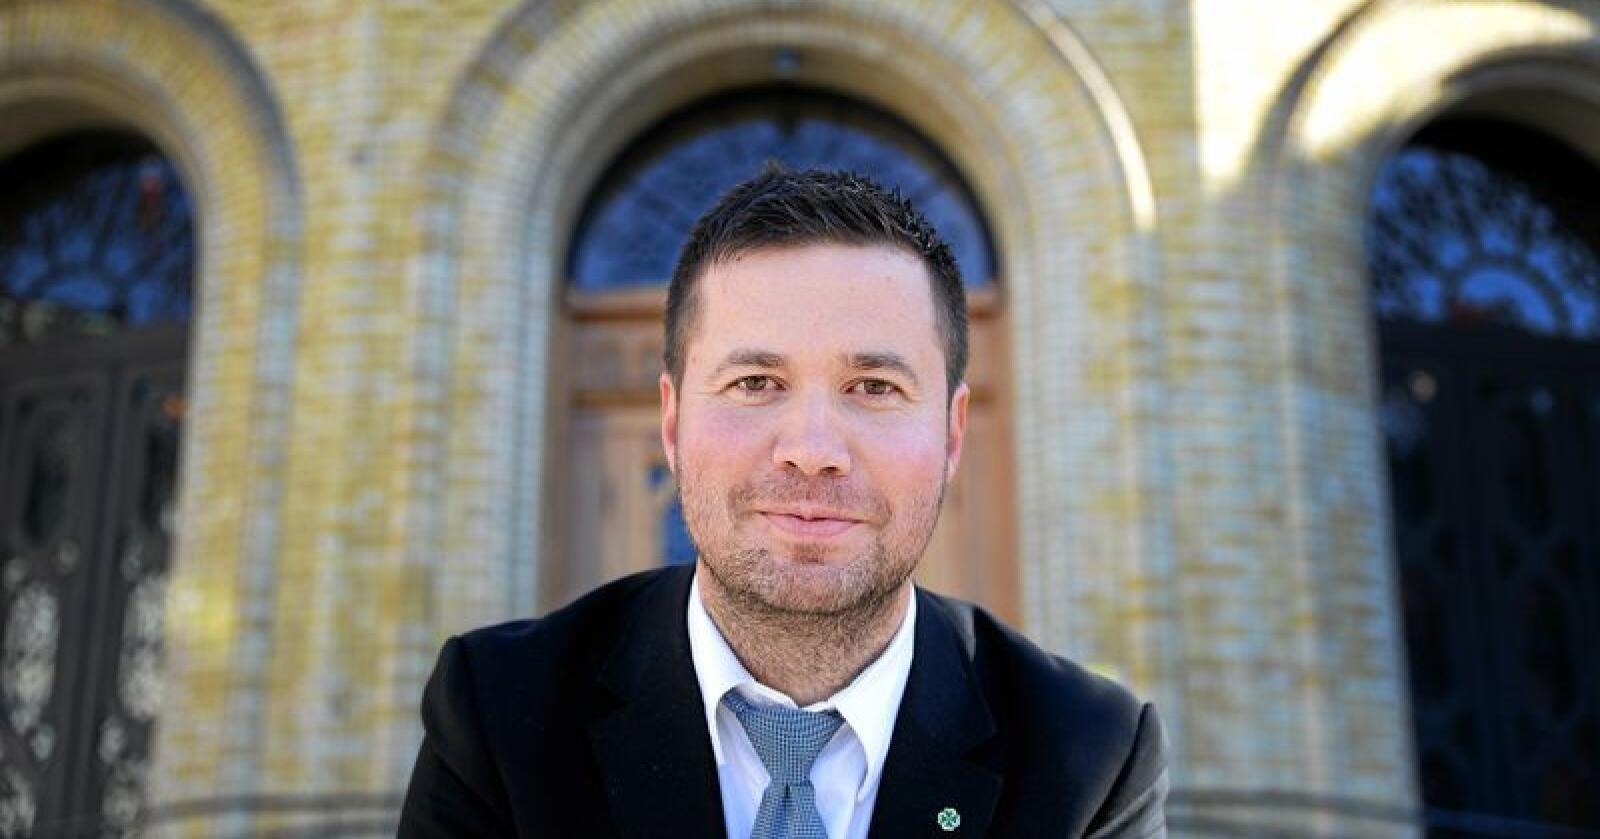 Næringspolitisk talsperson for Sp, Geir Pollestad. Foto: Siri Juell Rasmussen